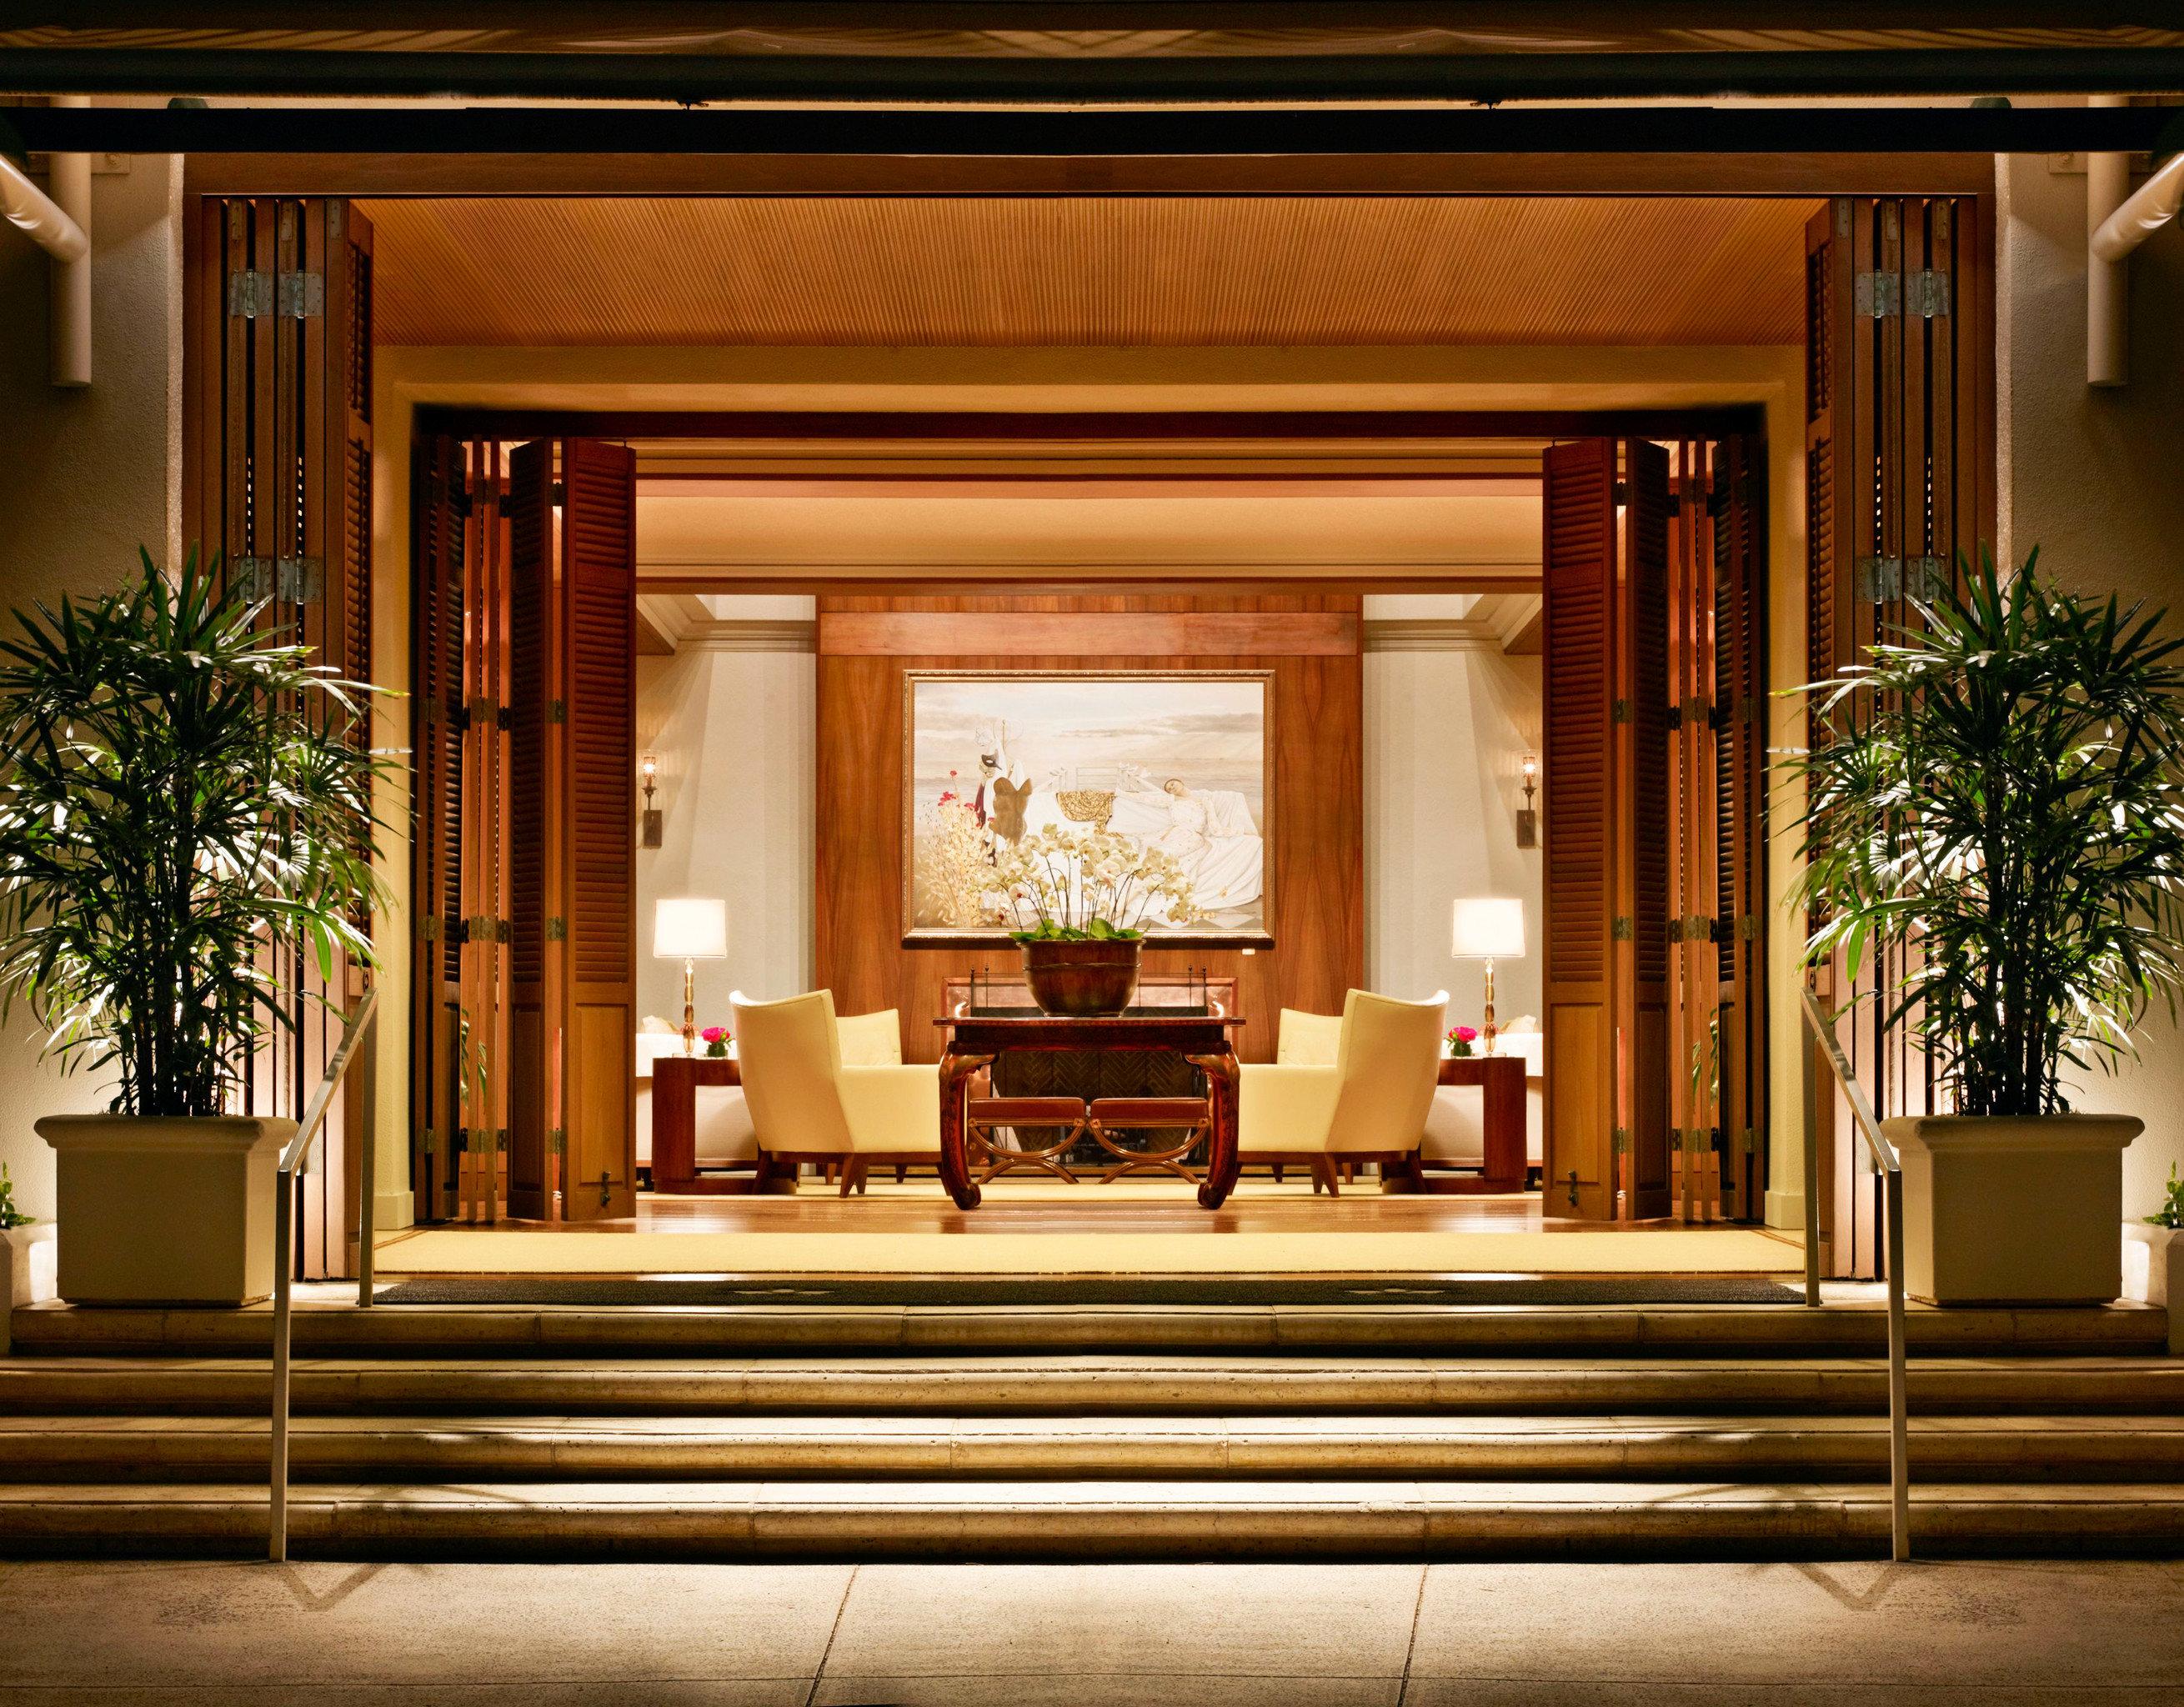 Boutique Hotels Design Hawaii Honolulu Hotels Lounge Luxury Resort indoor Lobby window home Architecture interior design estate lighting living room hall mansion furniture